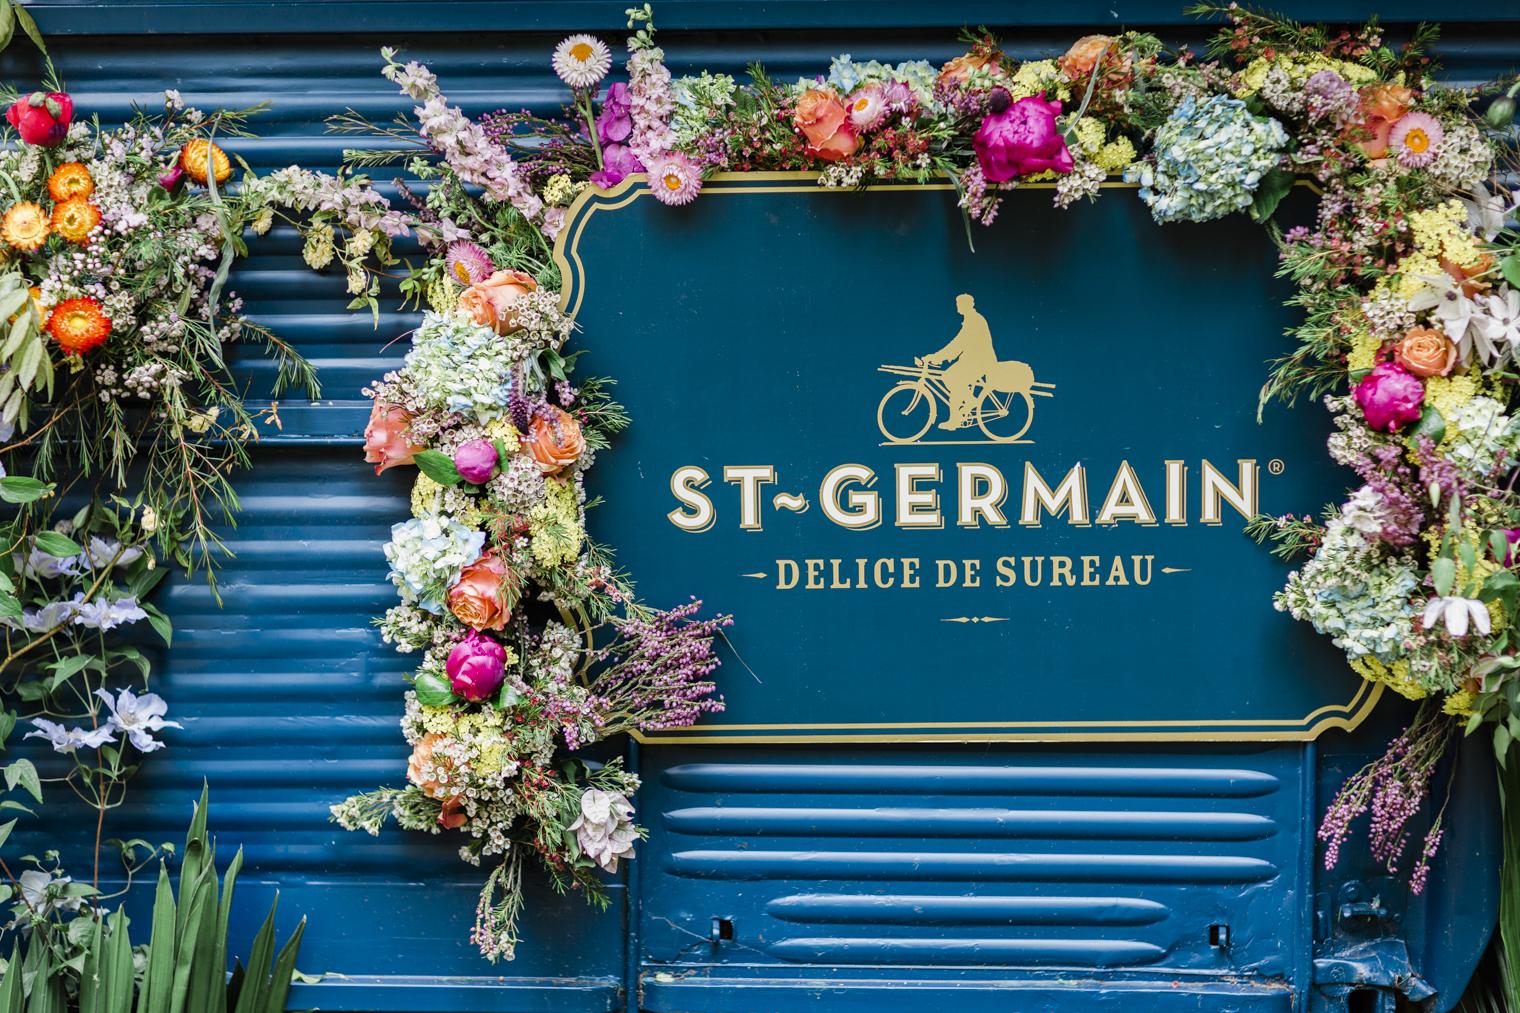 St Germain Truck at RHS Chelsea Flower Show 2019